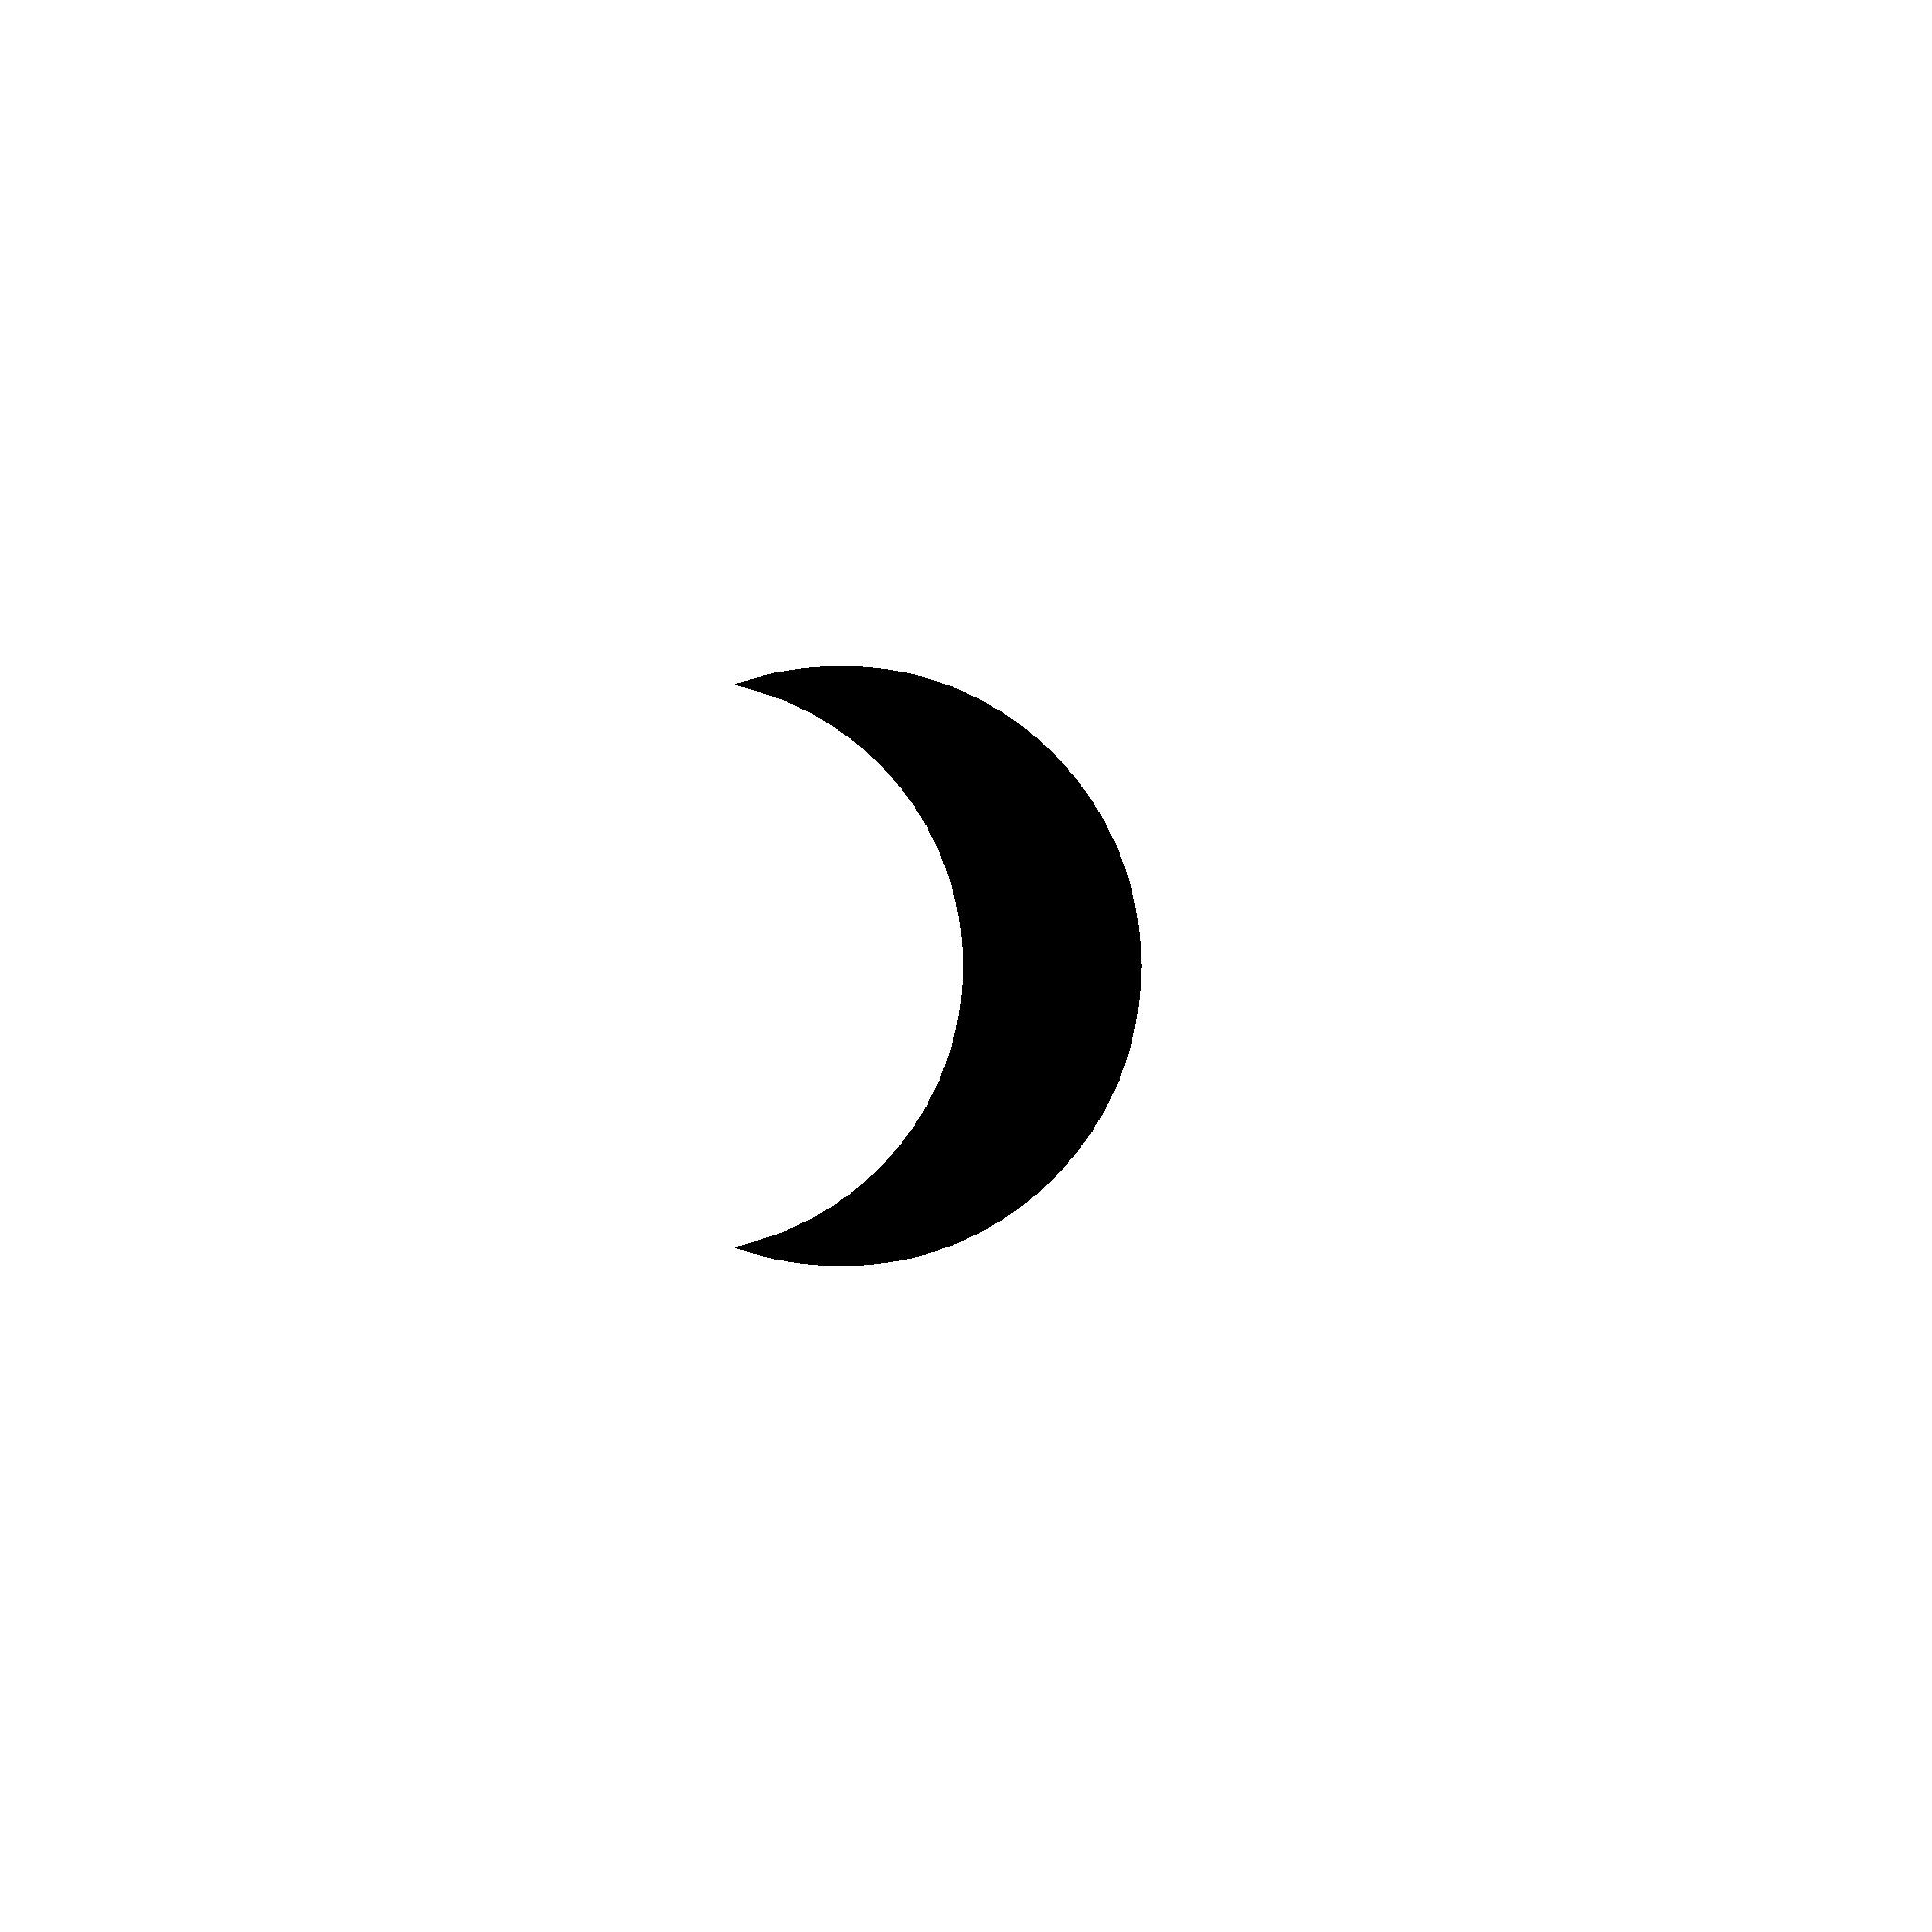 waxing_moon-01.png